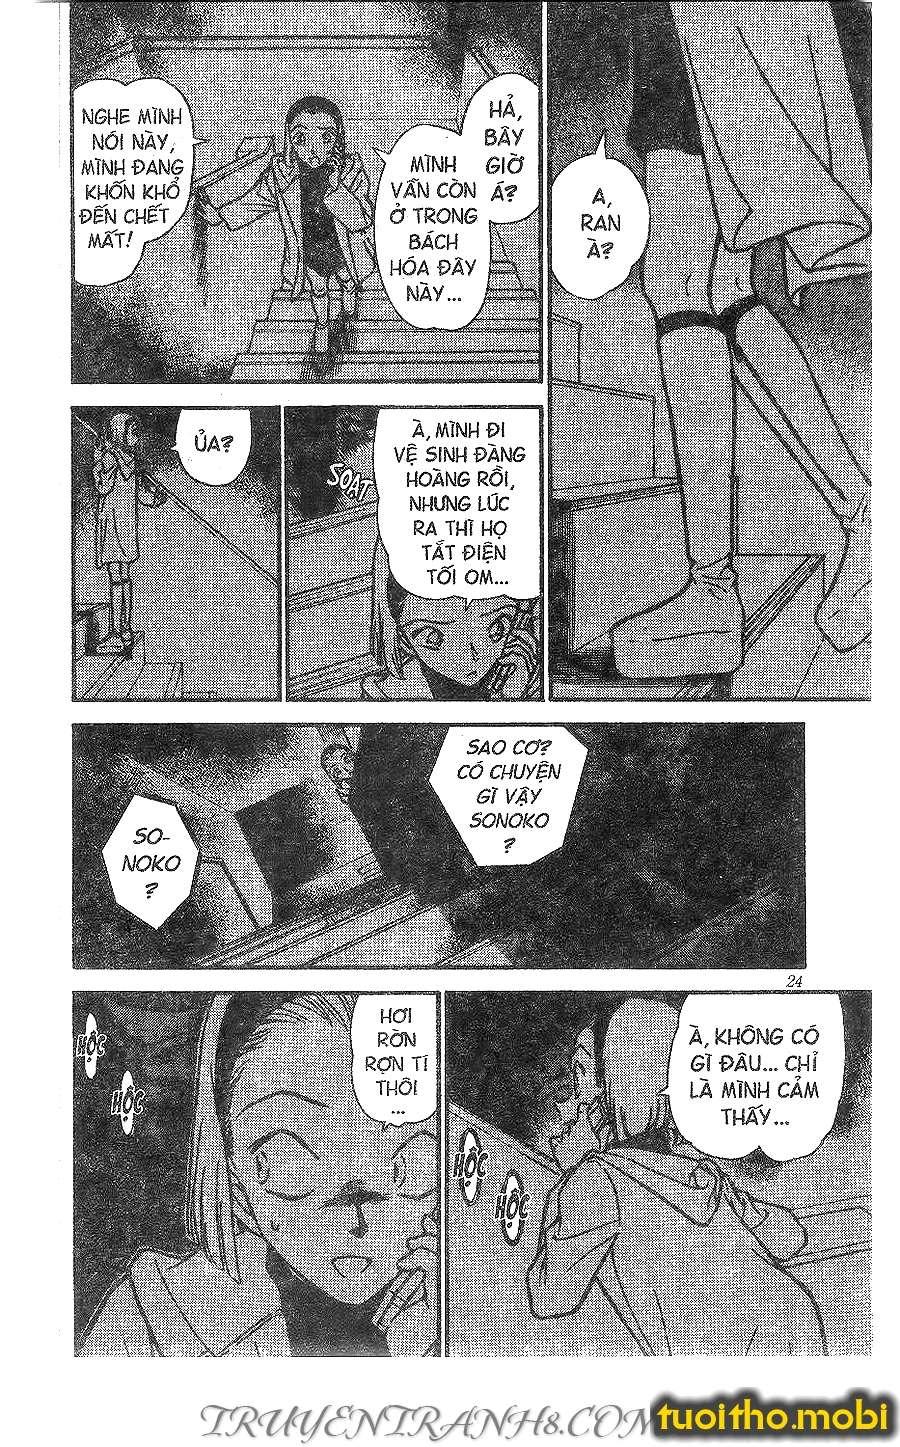 conan chương 286 trang 5